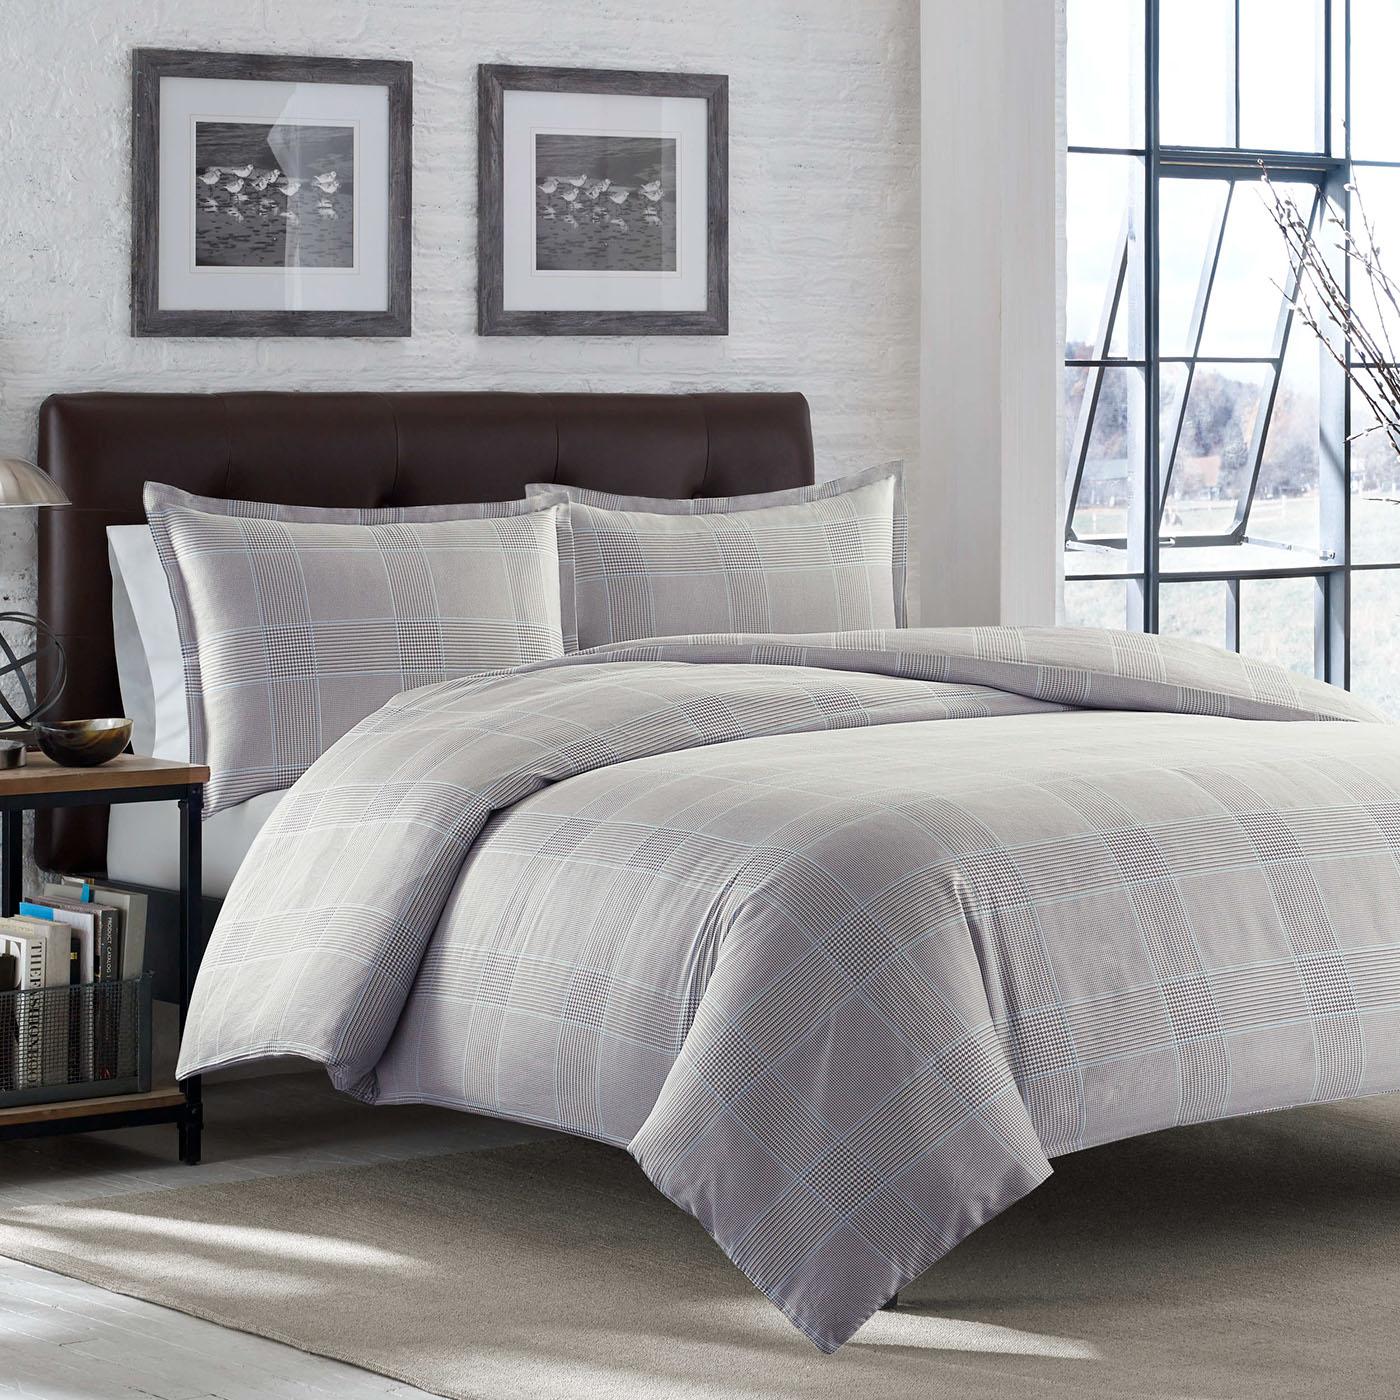 set comforter covers bedding bauer sets sheet of s bassinet photo baby bed full eddie duvet size